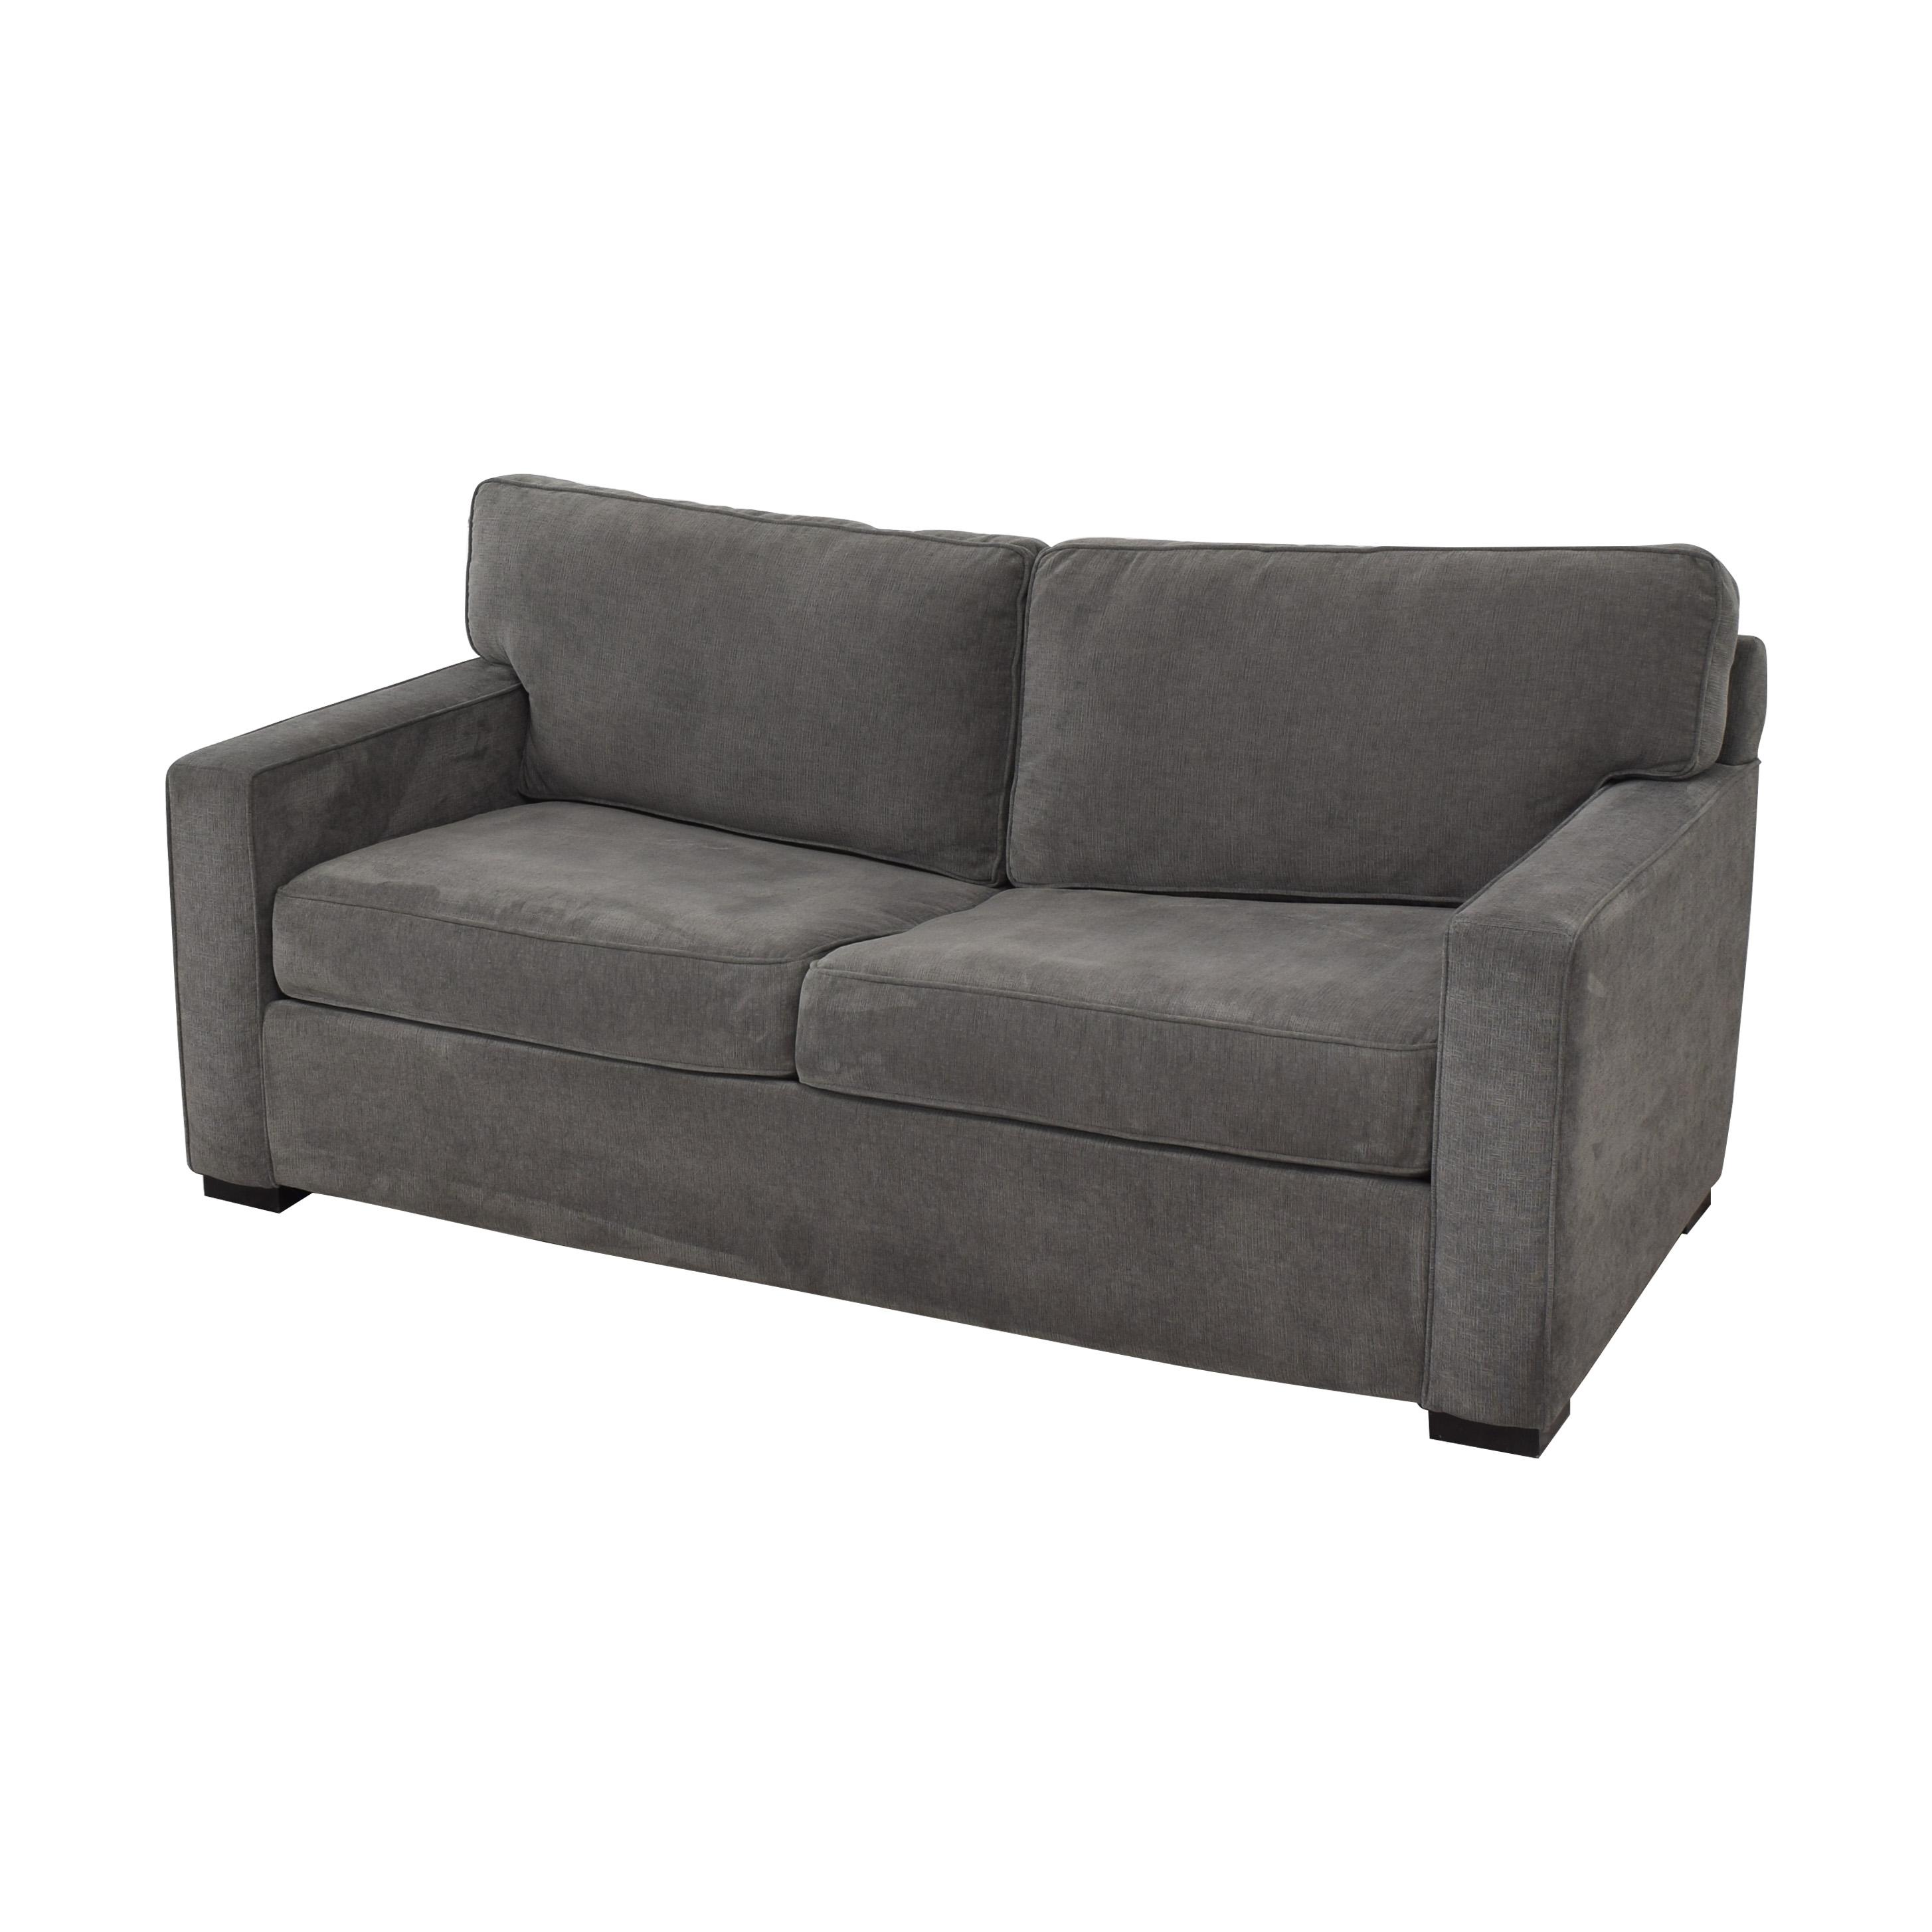 Macy's Macy's Radley Full Sleeper Sofa Bed for sale